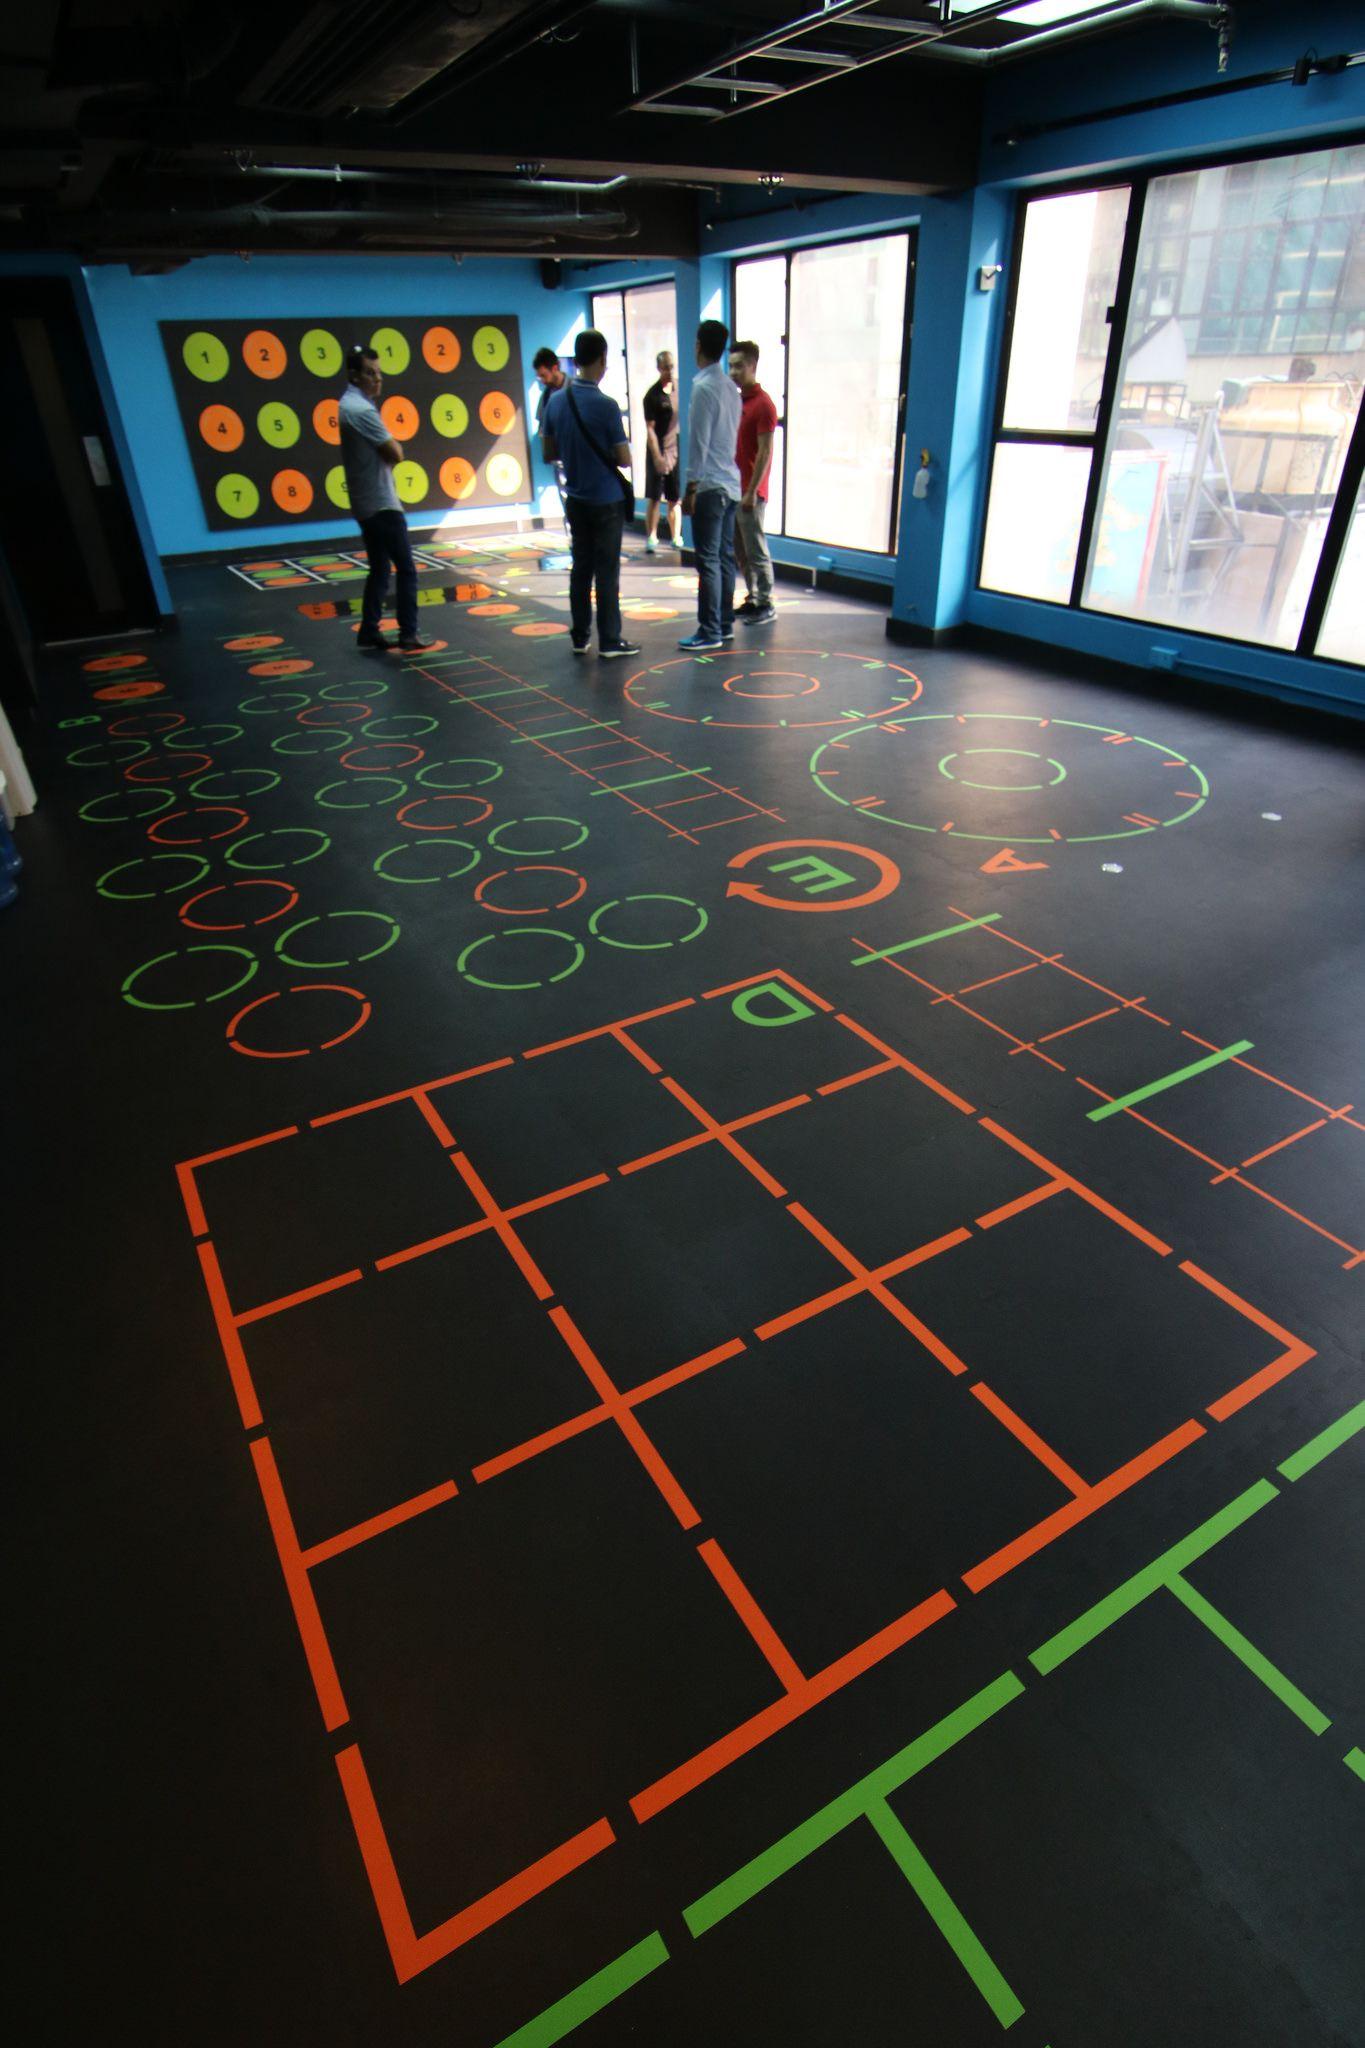 prama hong kong prama the interactive fitness platform pinterest. Black Bedroom Furniture Sets. Home Design Ideas